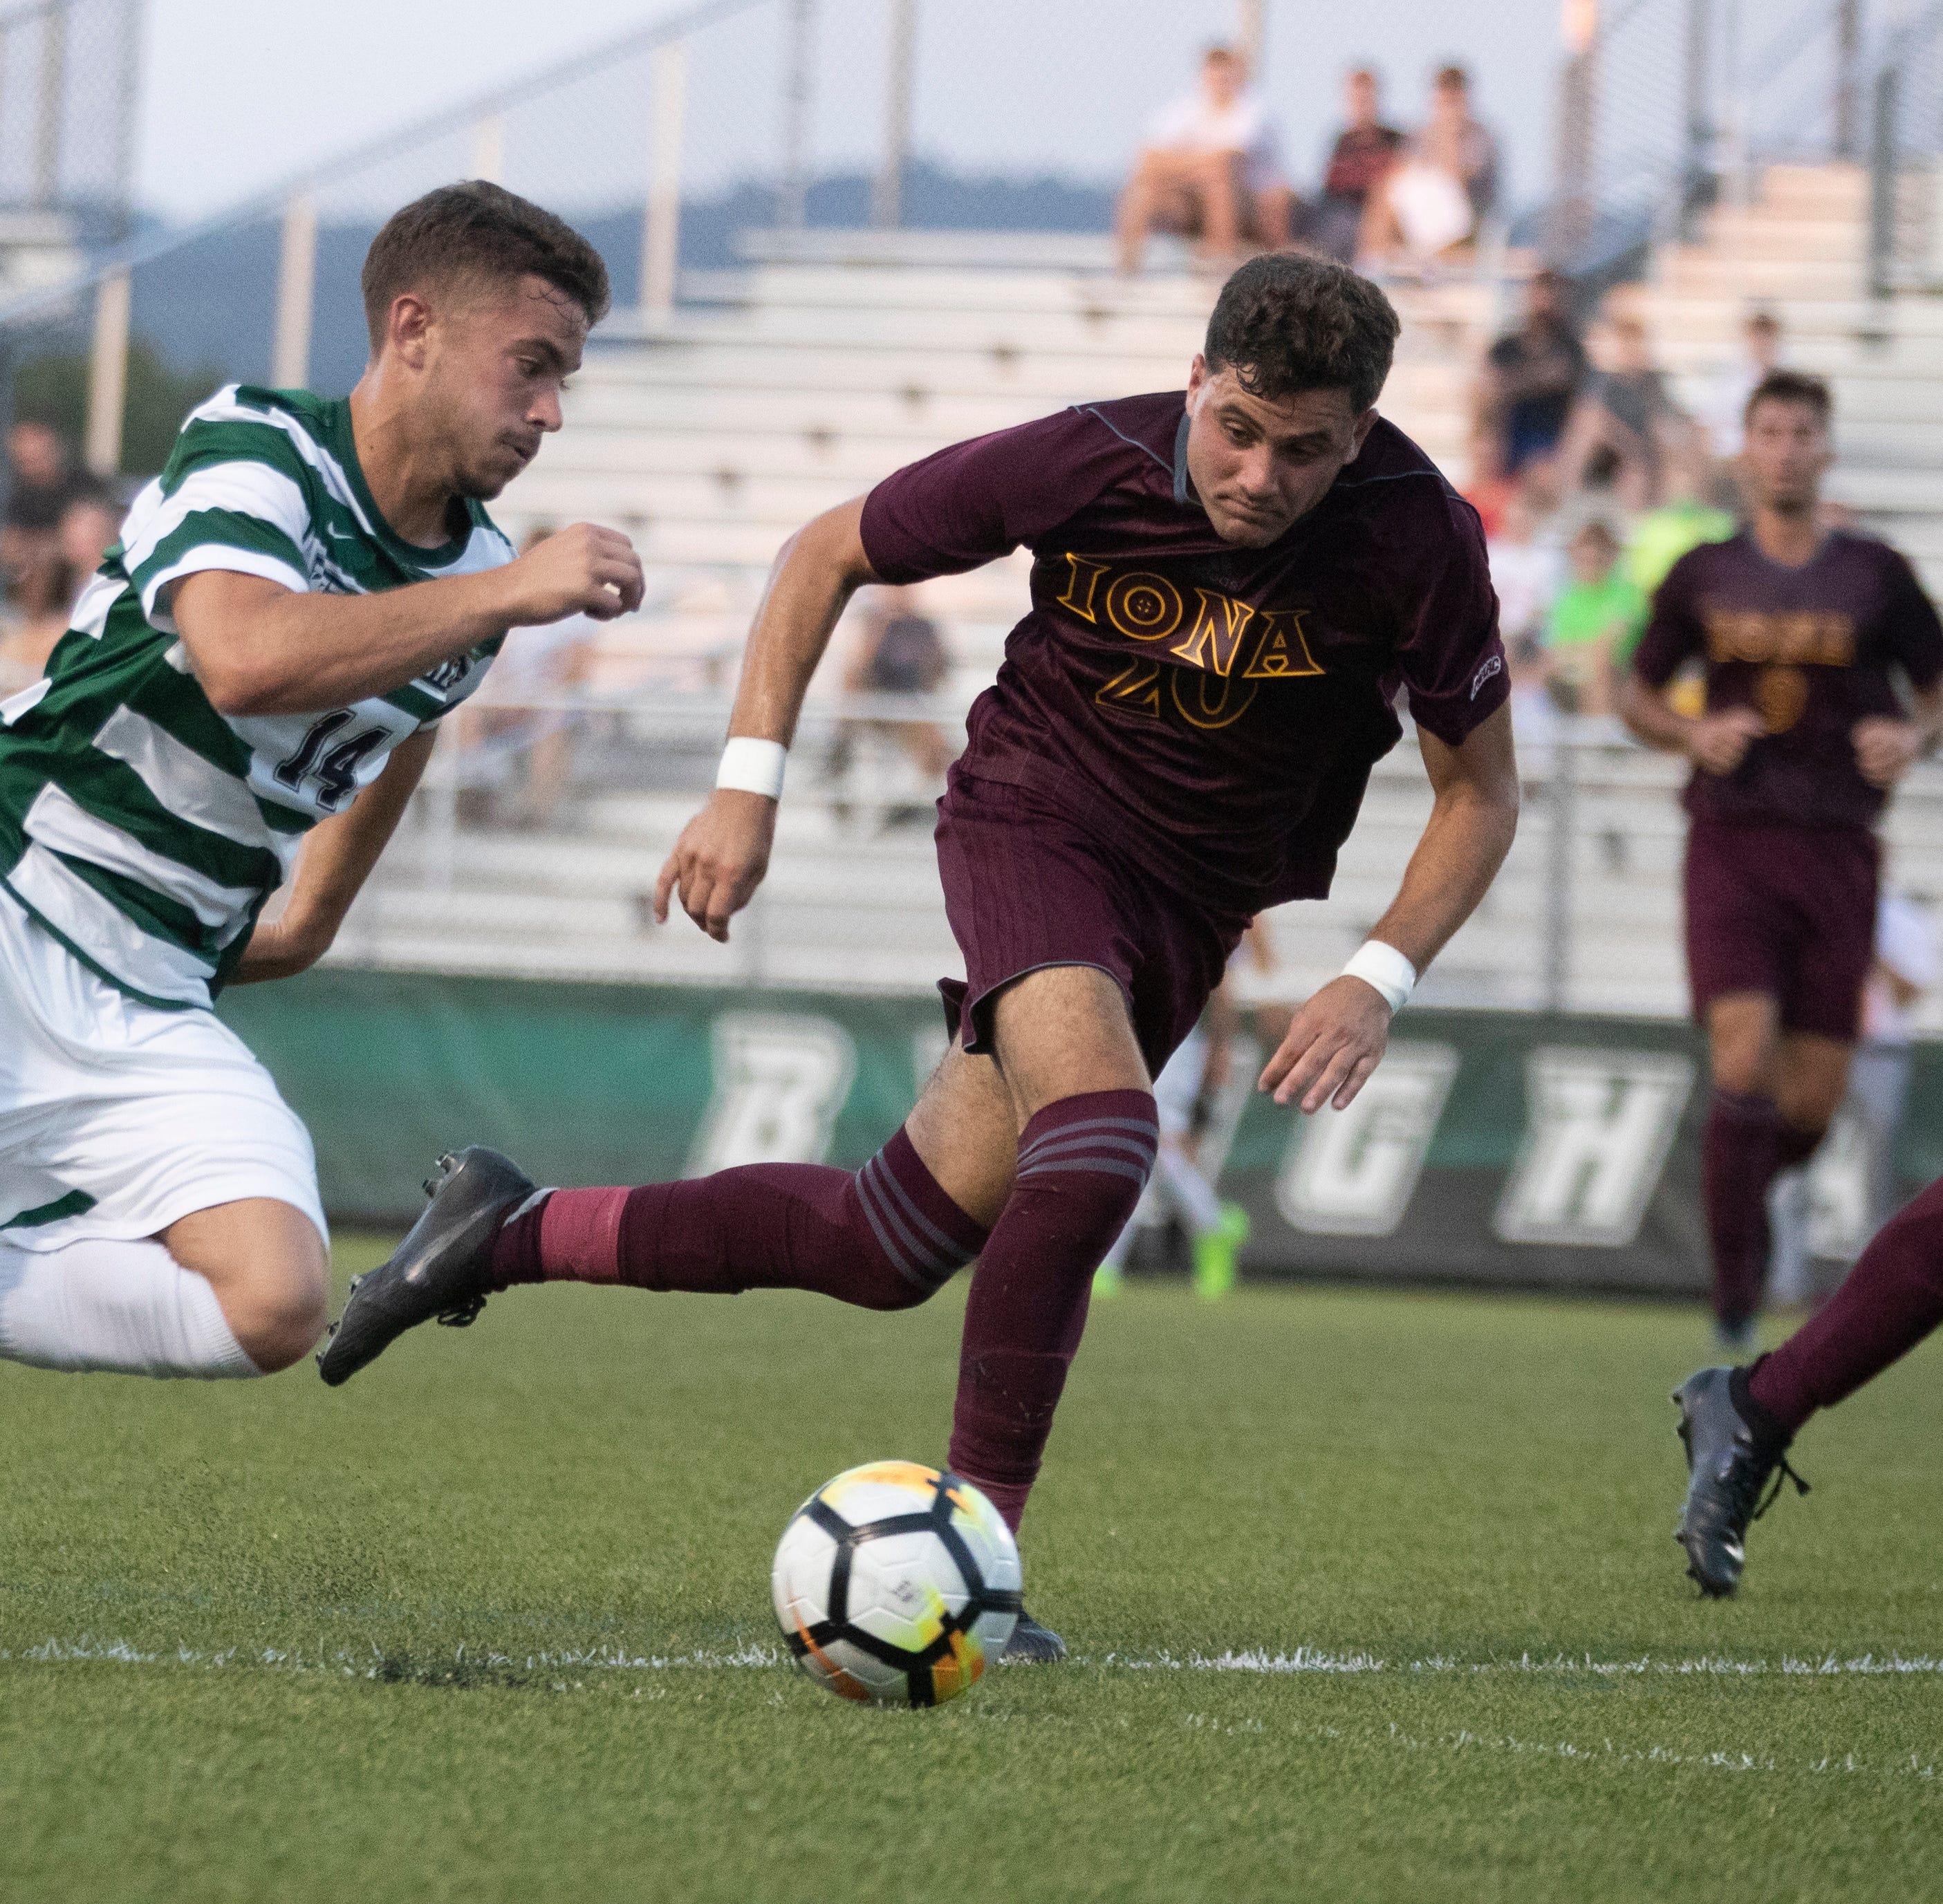 Local talent dots Binghamton U. men's soccer roster